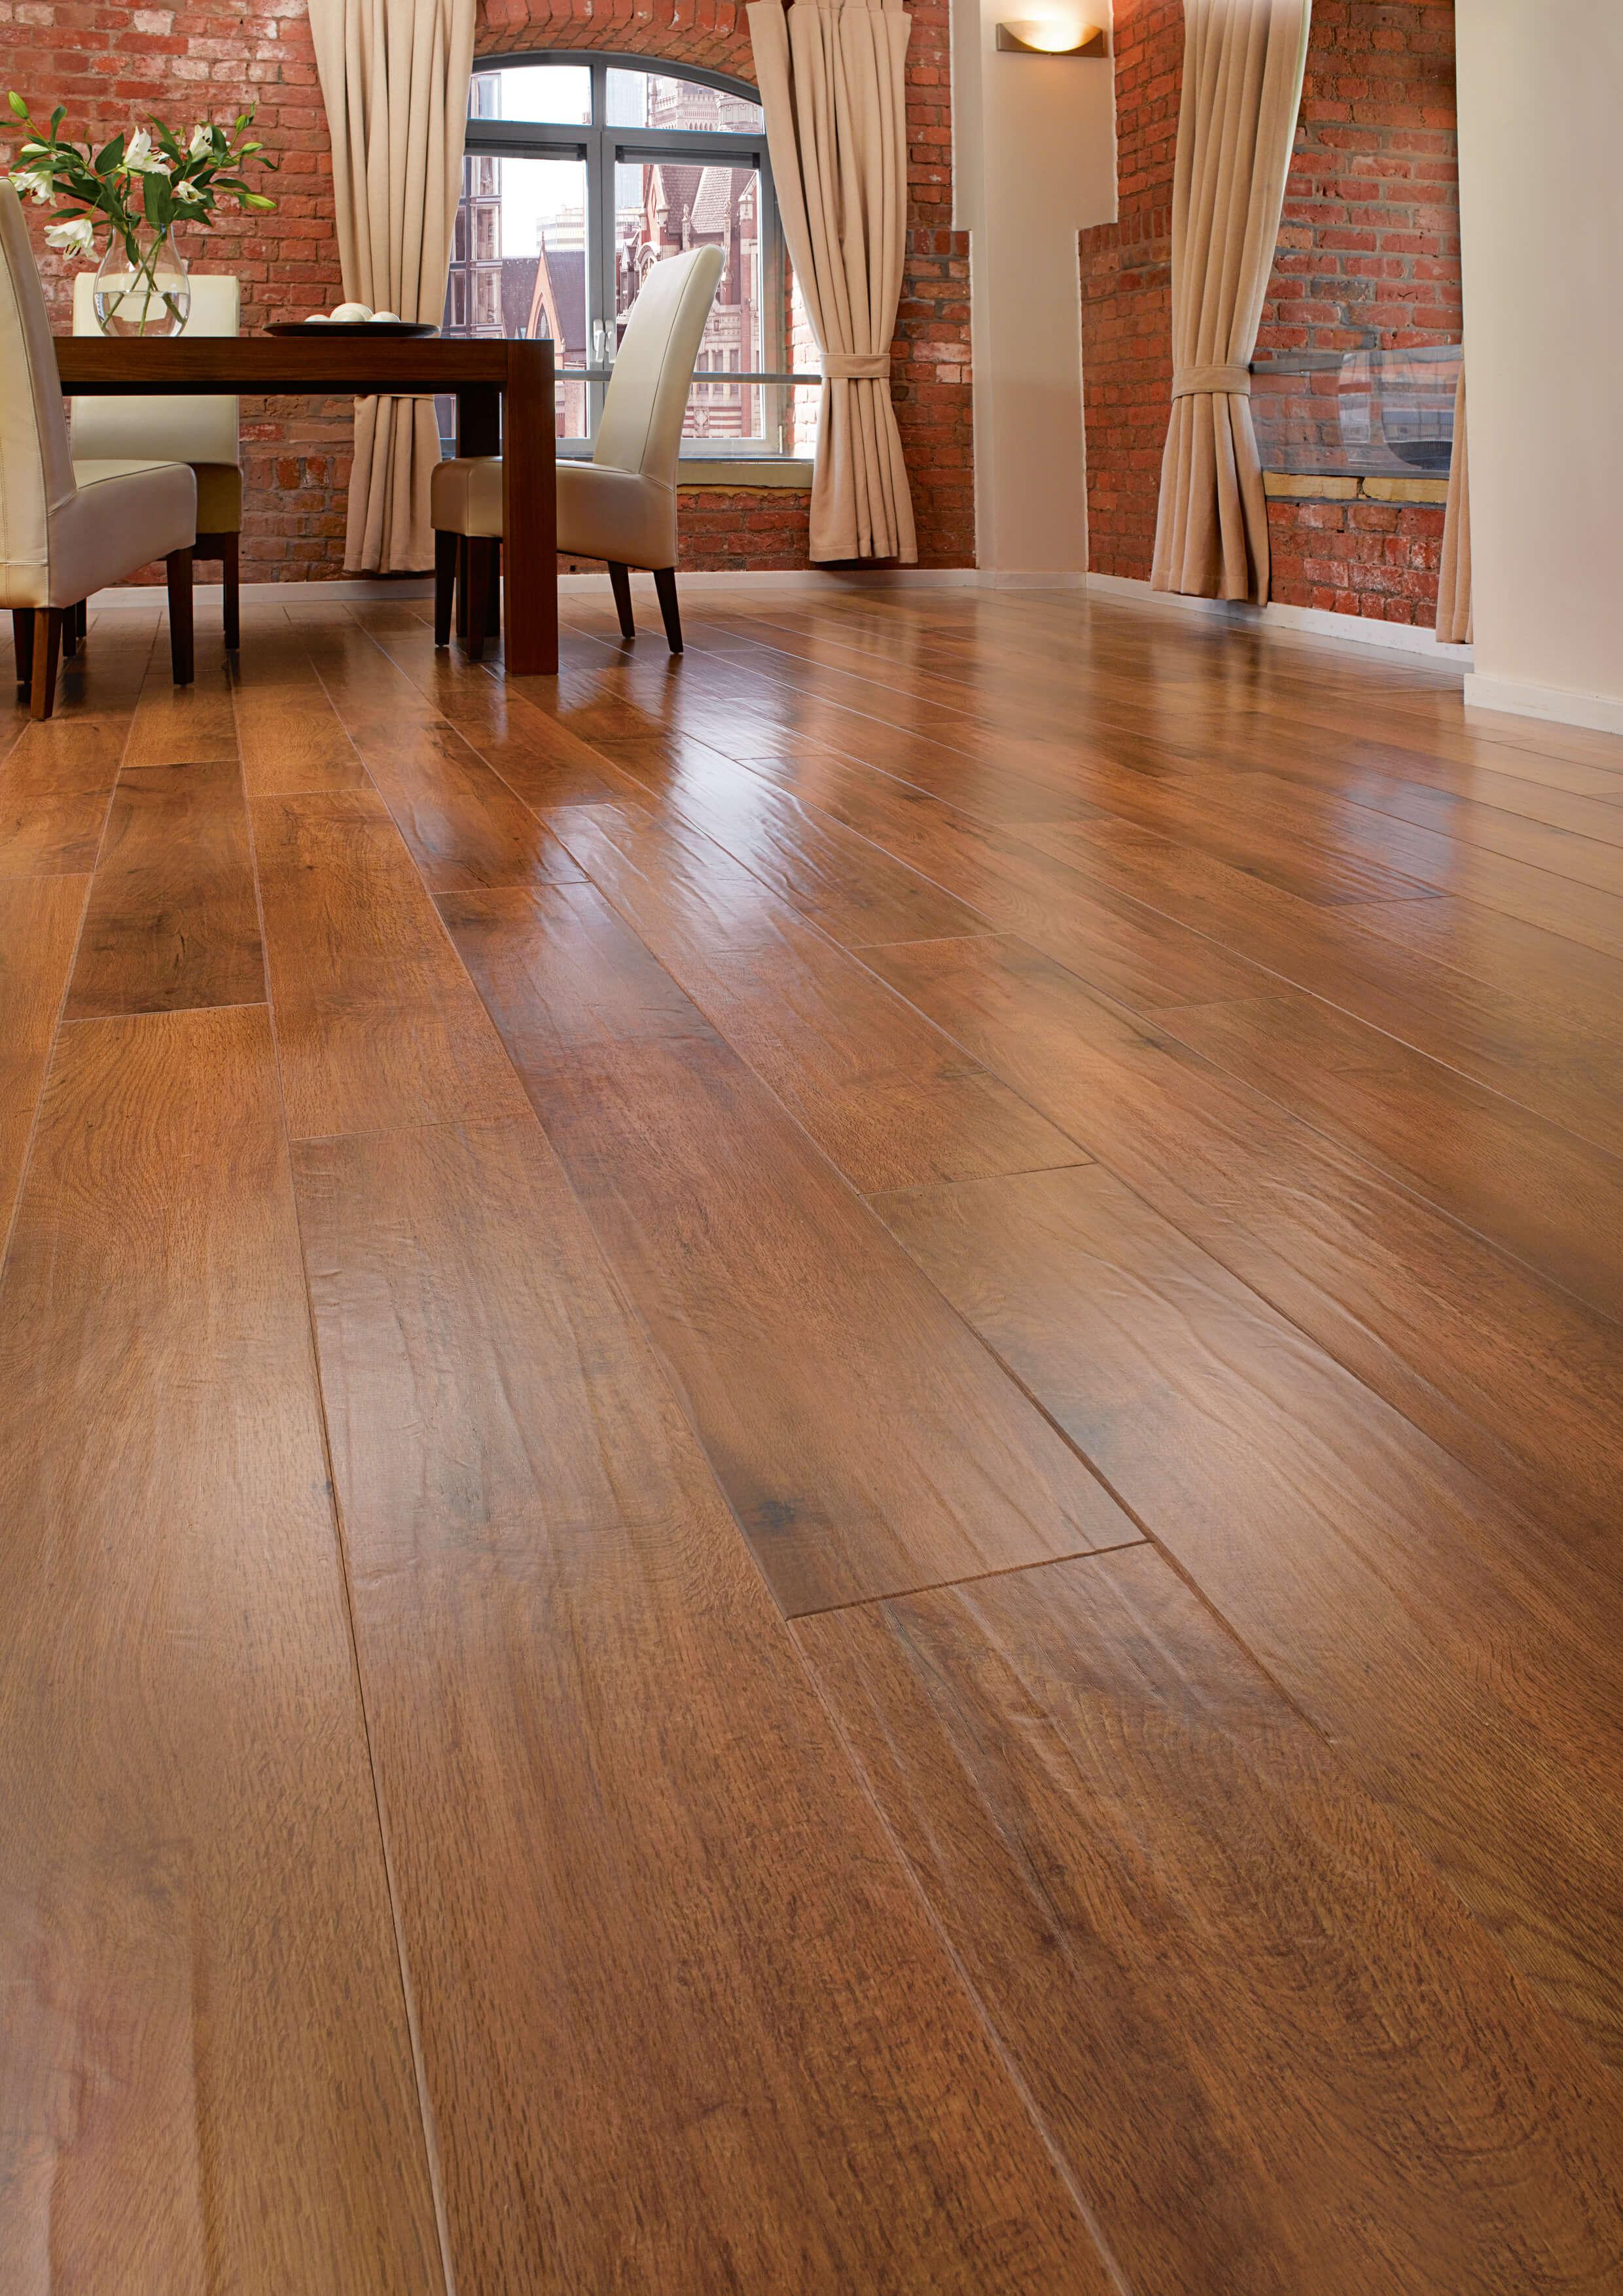 da floor molten karndean why fludes carpets flooring vinci choose designflooring